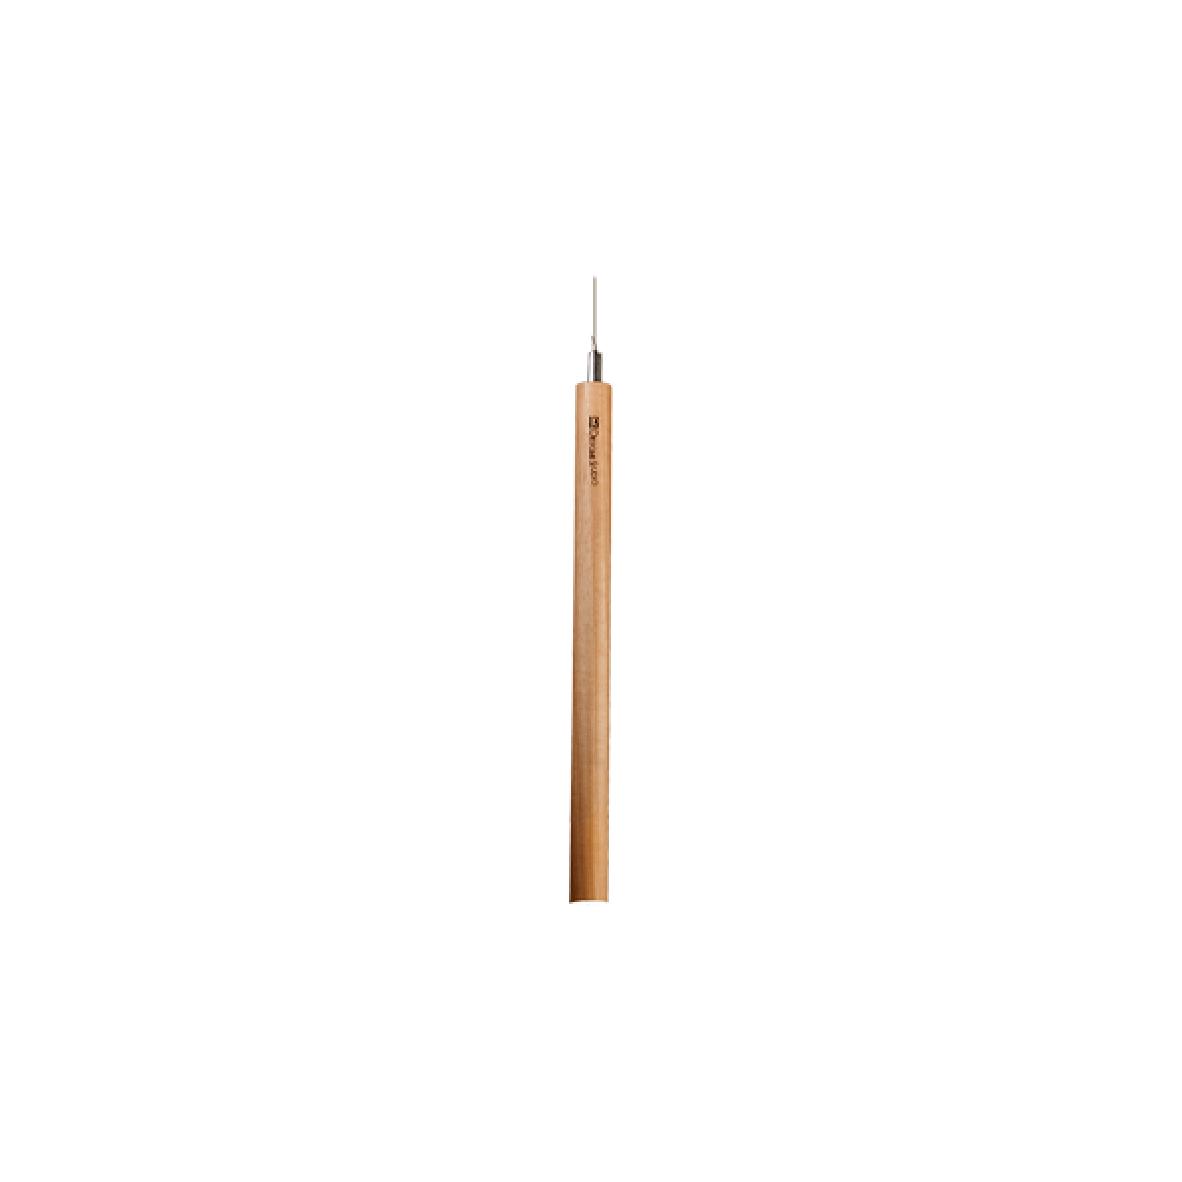 چراغ دکوراتیو چوبی SO-1381-50CM-Sآویز